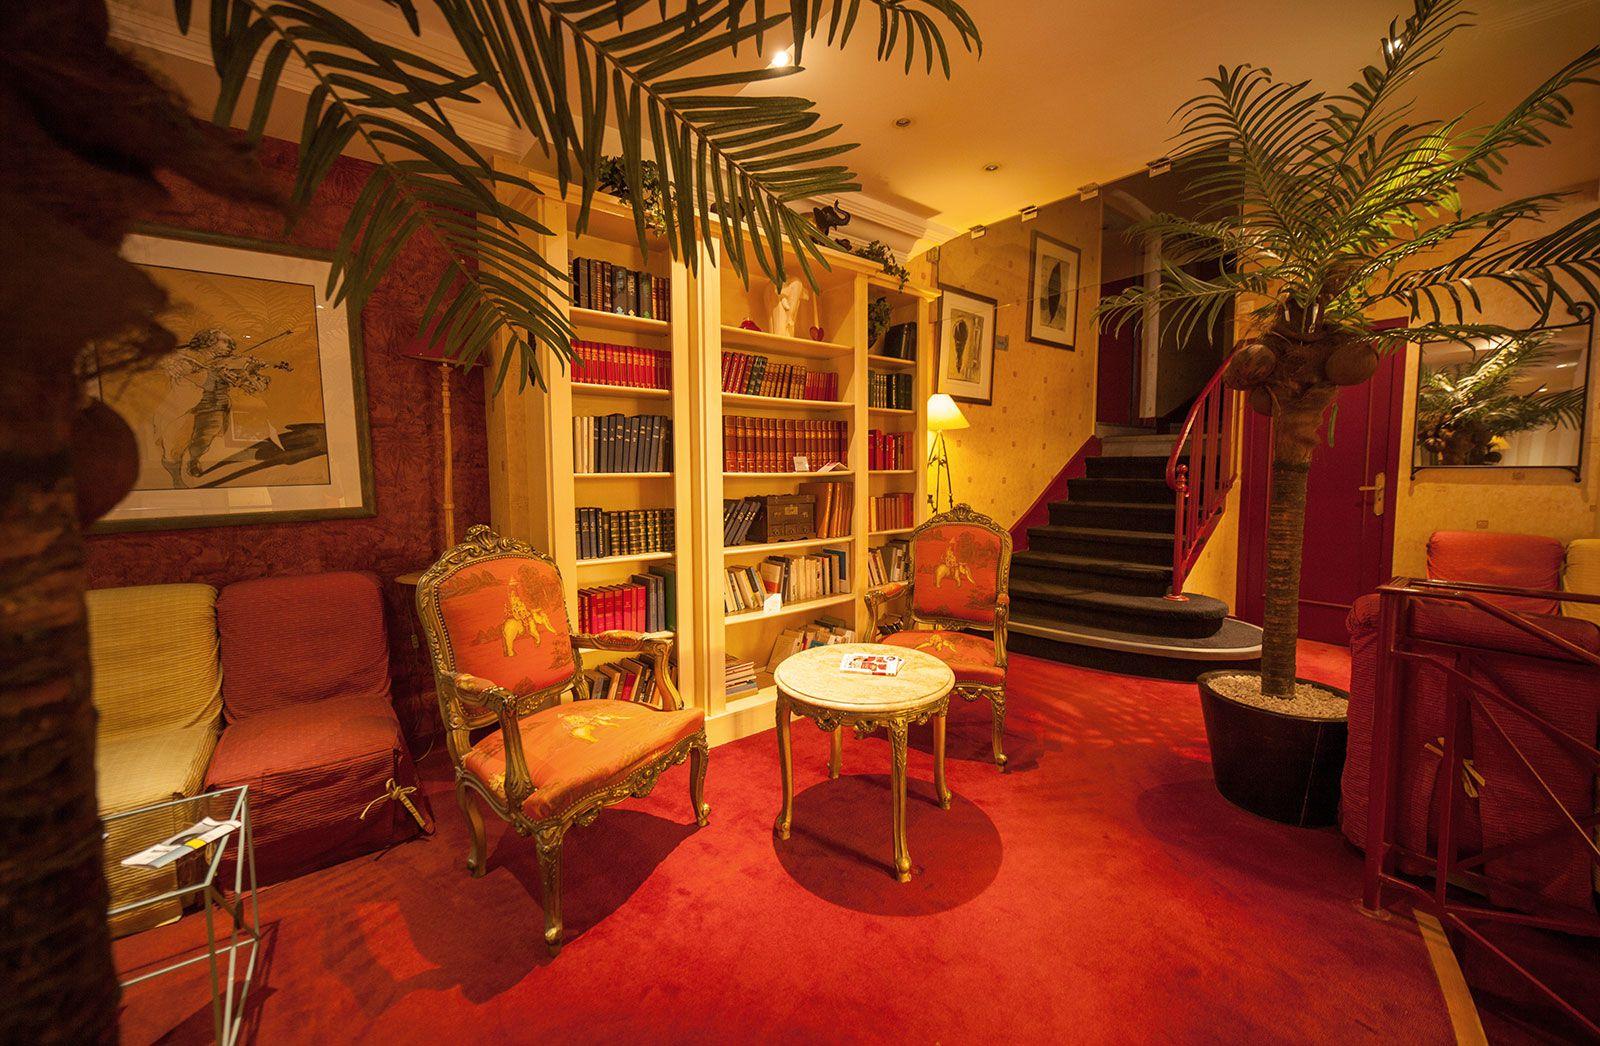 Chambéry Hotel des Princes elegance room